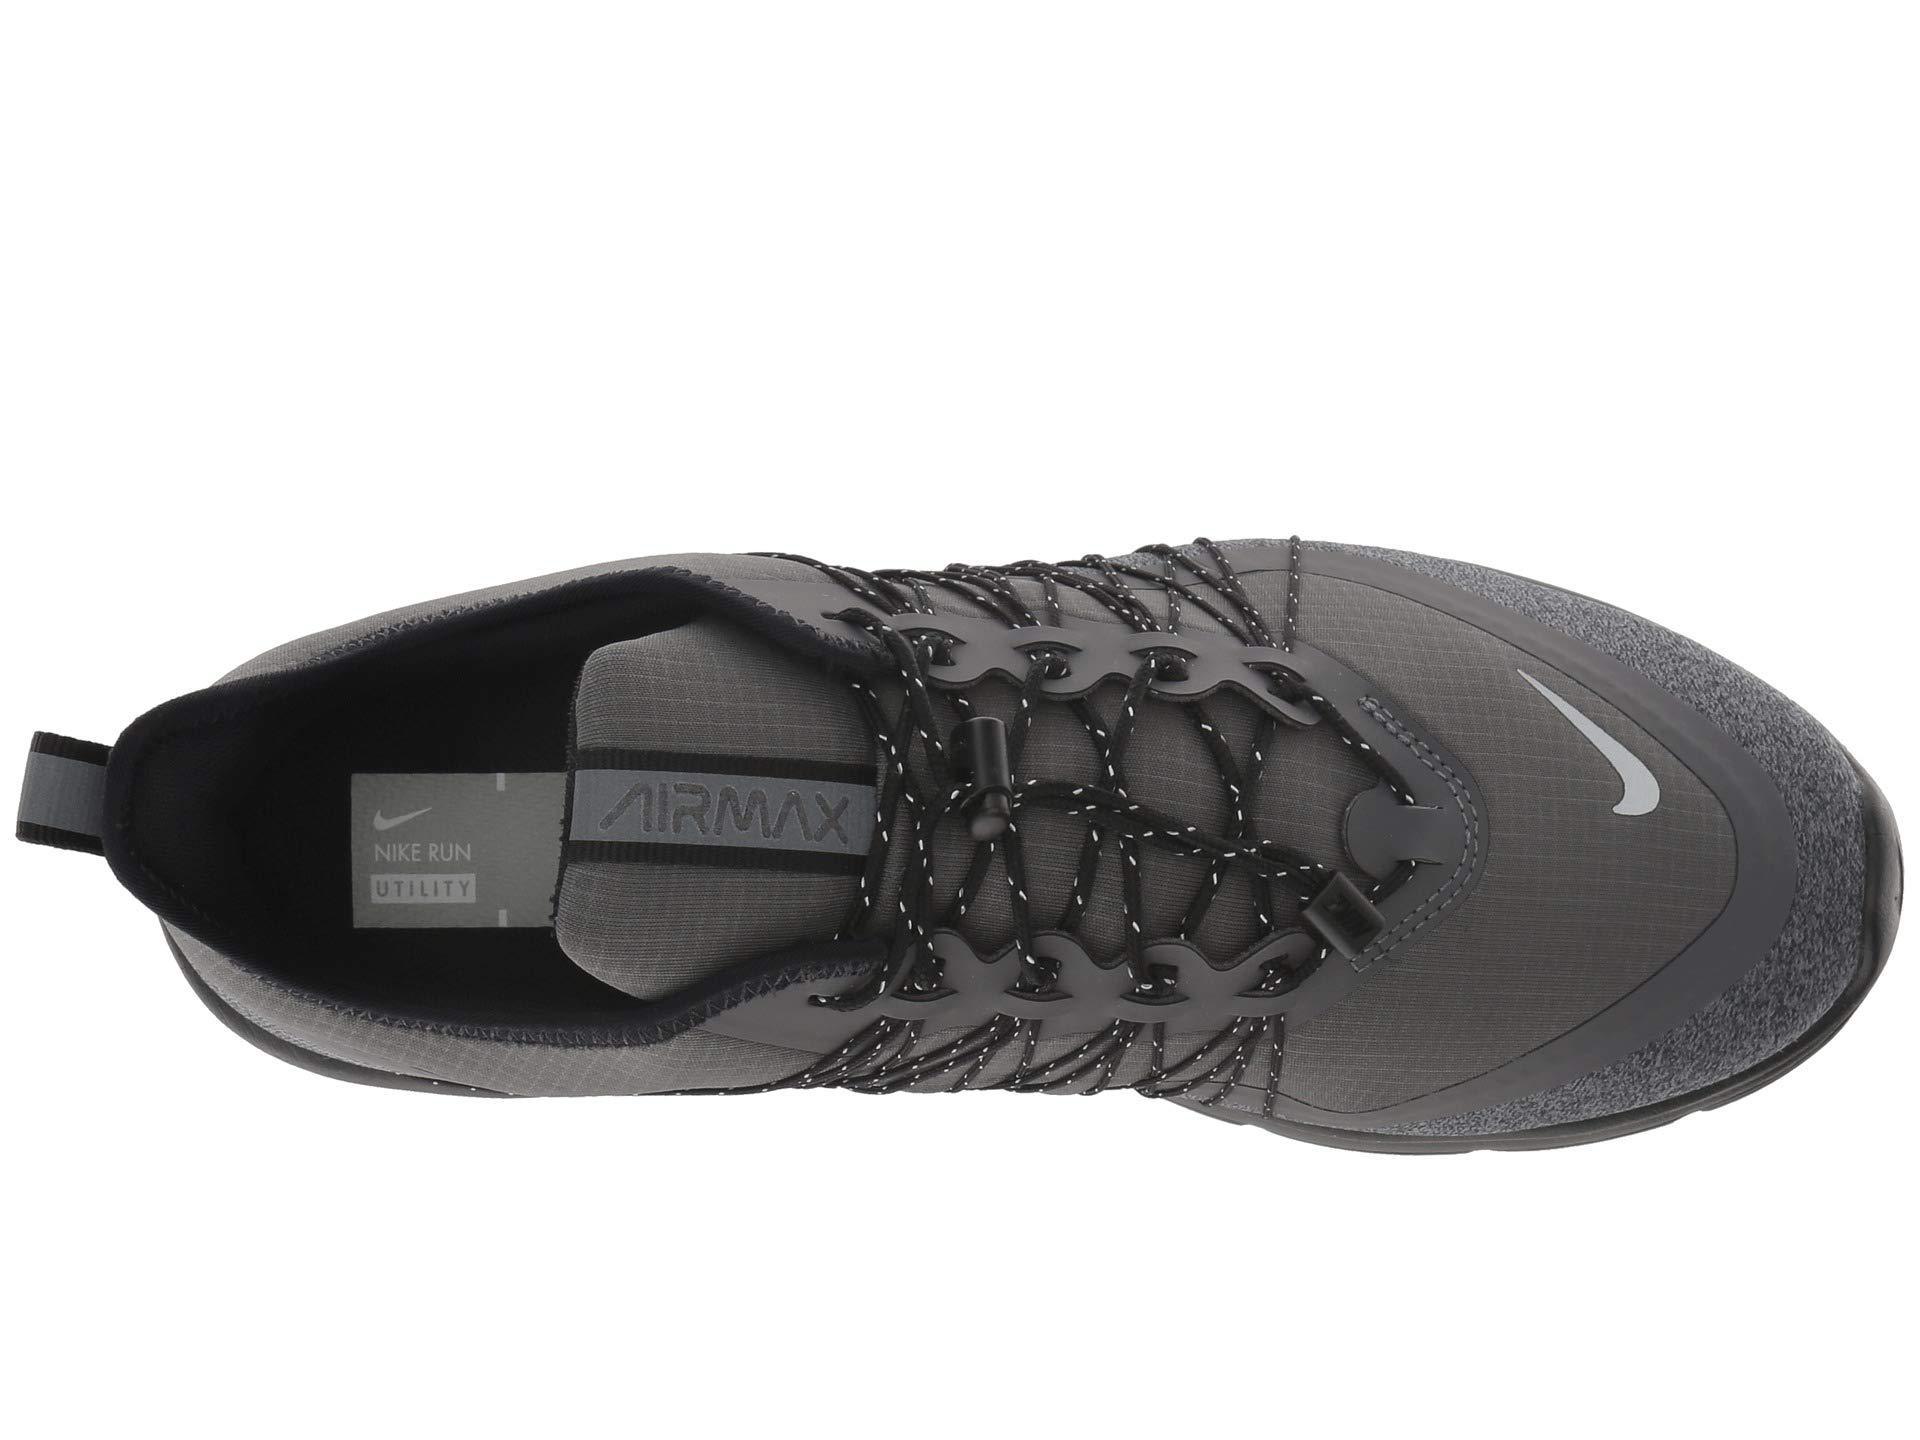 db745cacc6 Nike Air Max Sequent 4 Shield (dark Grey/metallic Silver/black ...